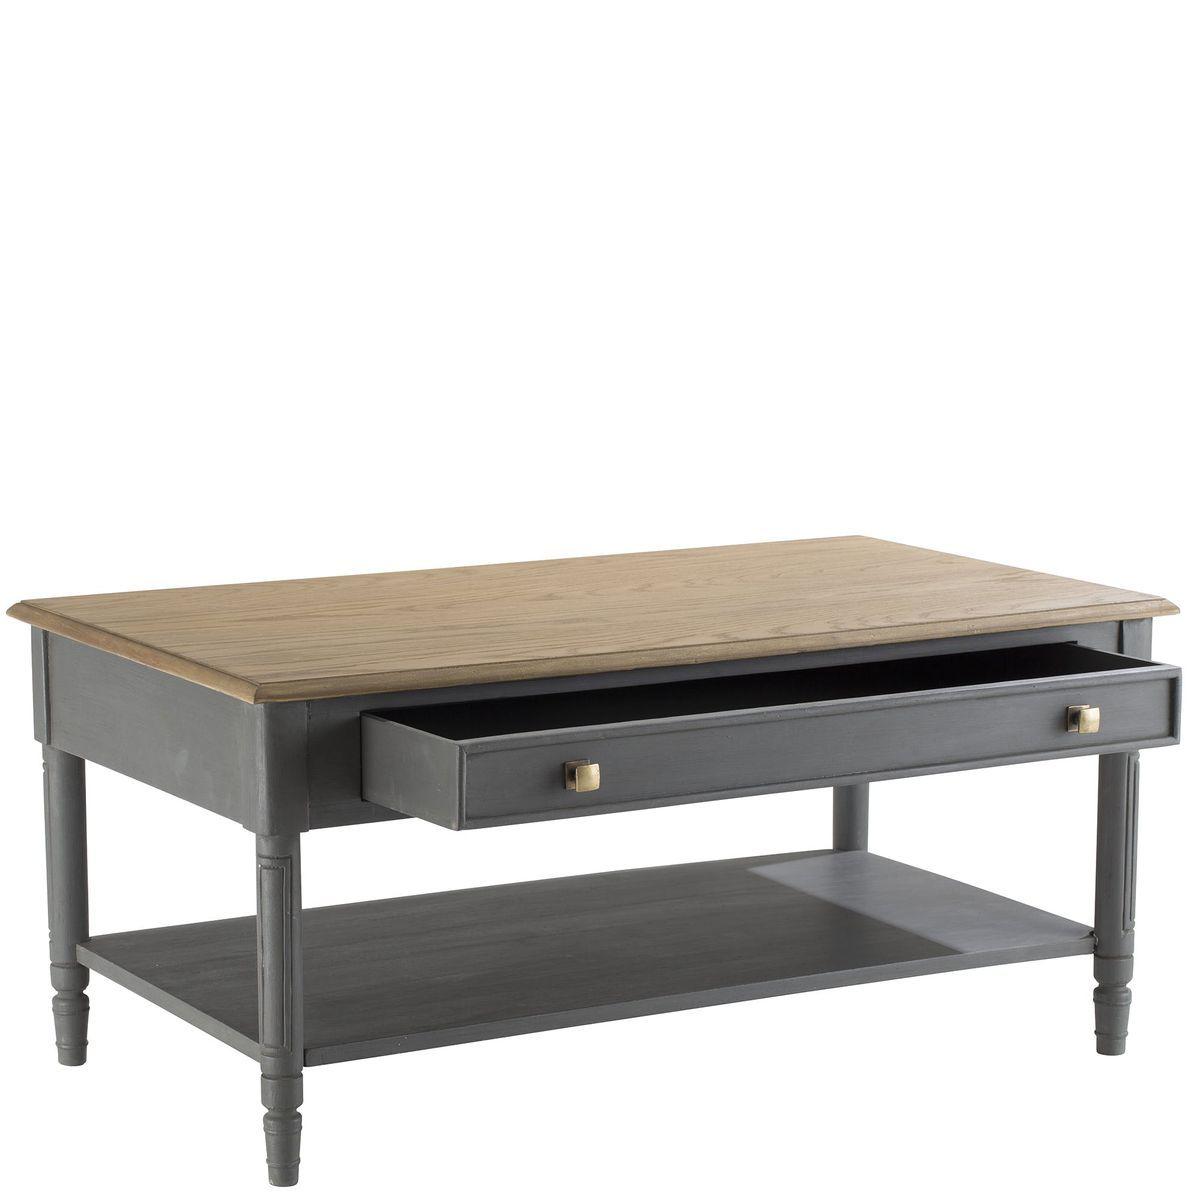 Table Basse Chene Grise 1 Tiroir Leon H50xl110xp60cm Amadeus Taille Taille Unique Table Basse Chene Table Basse Table Basse Tiroir